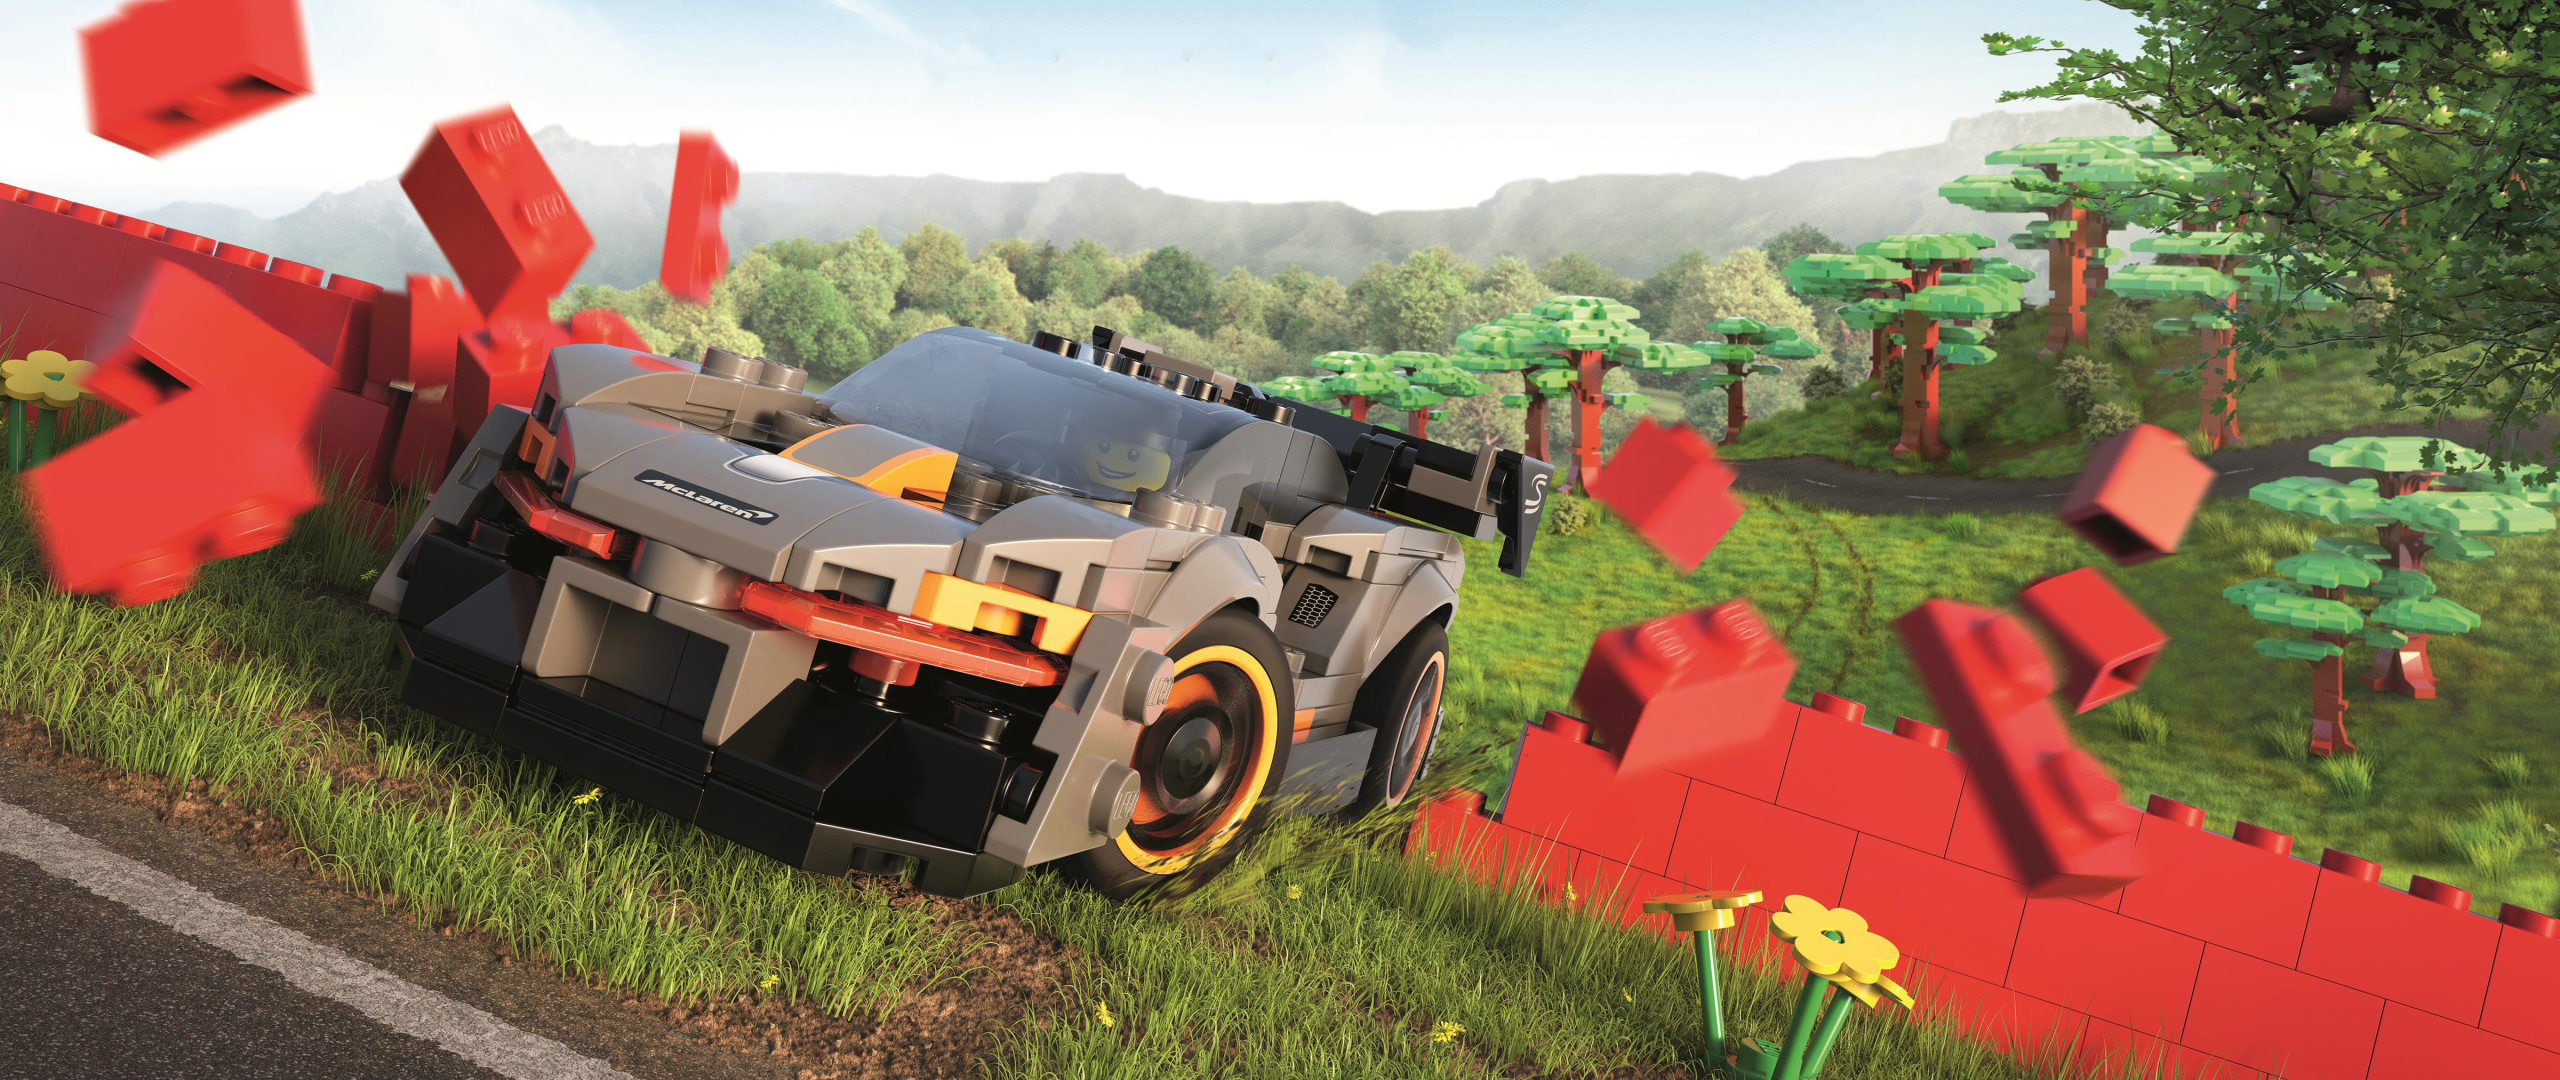 Forza Horizon Lego Wallpaper in 2560x1080 Resolution